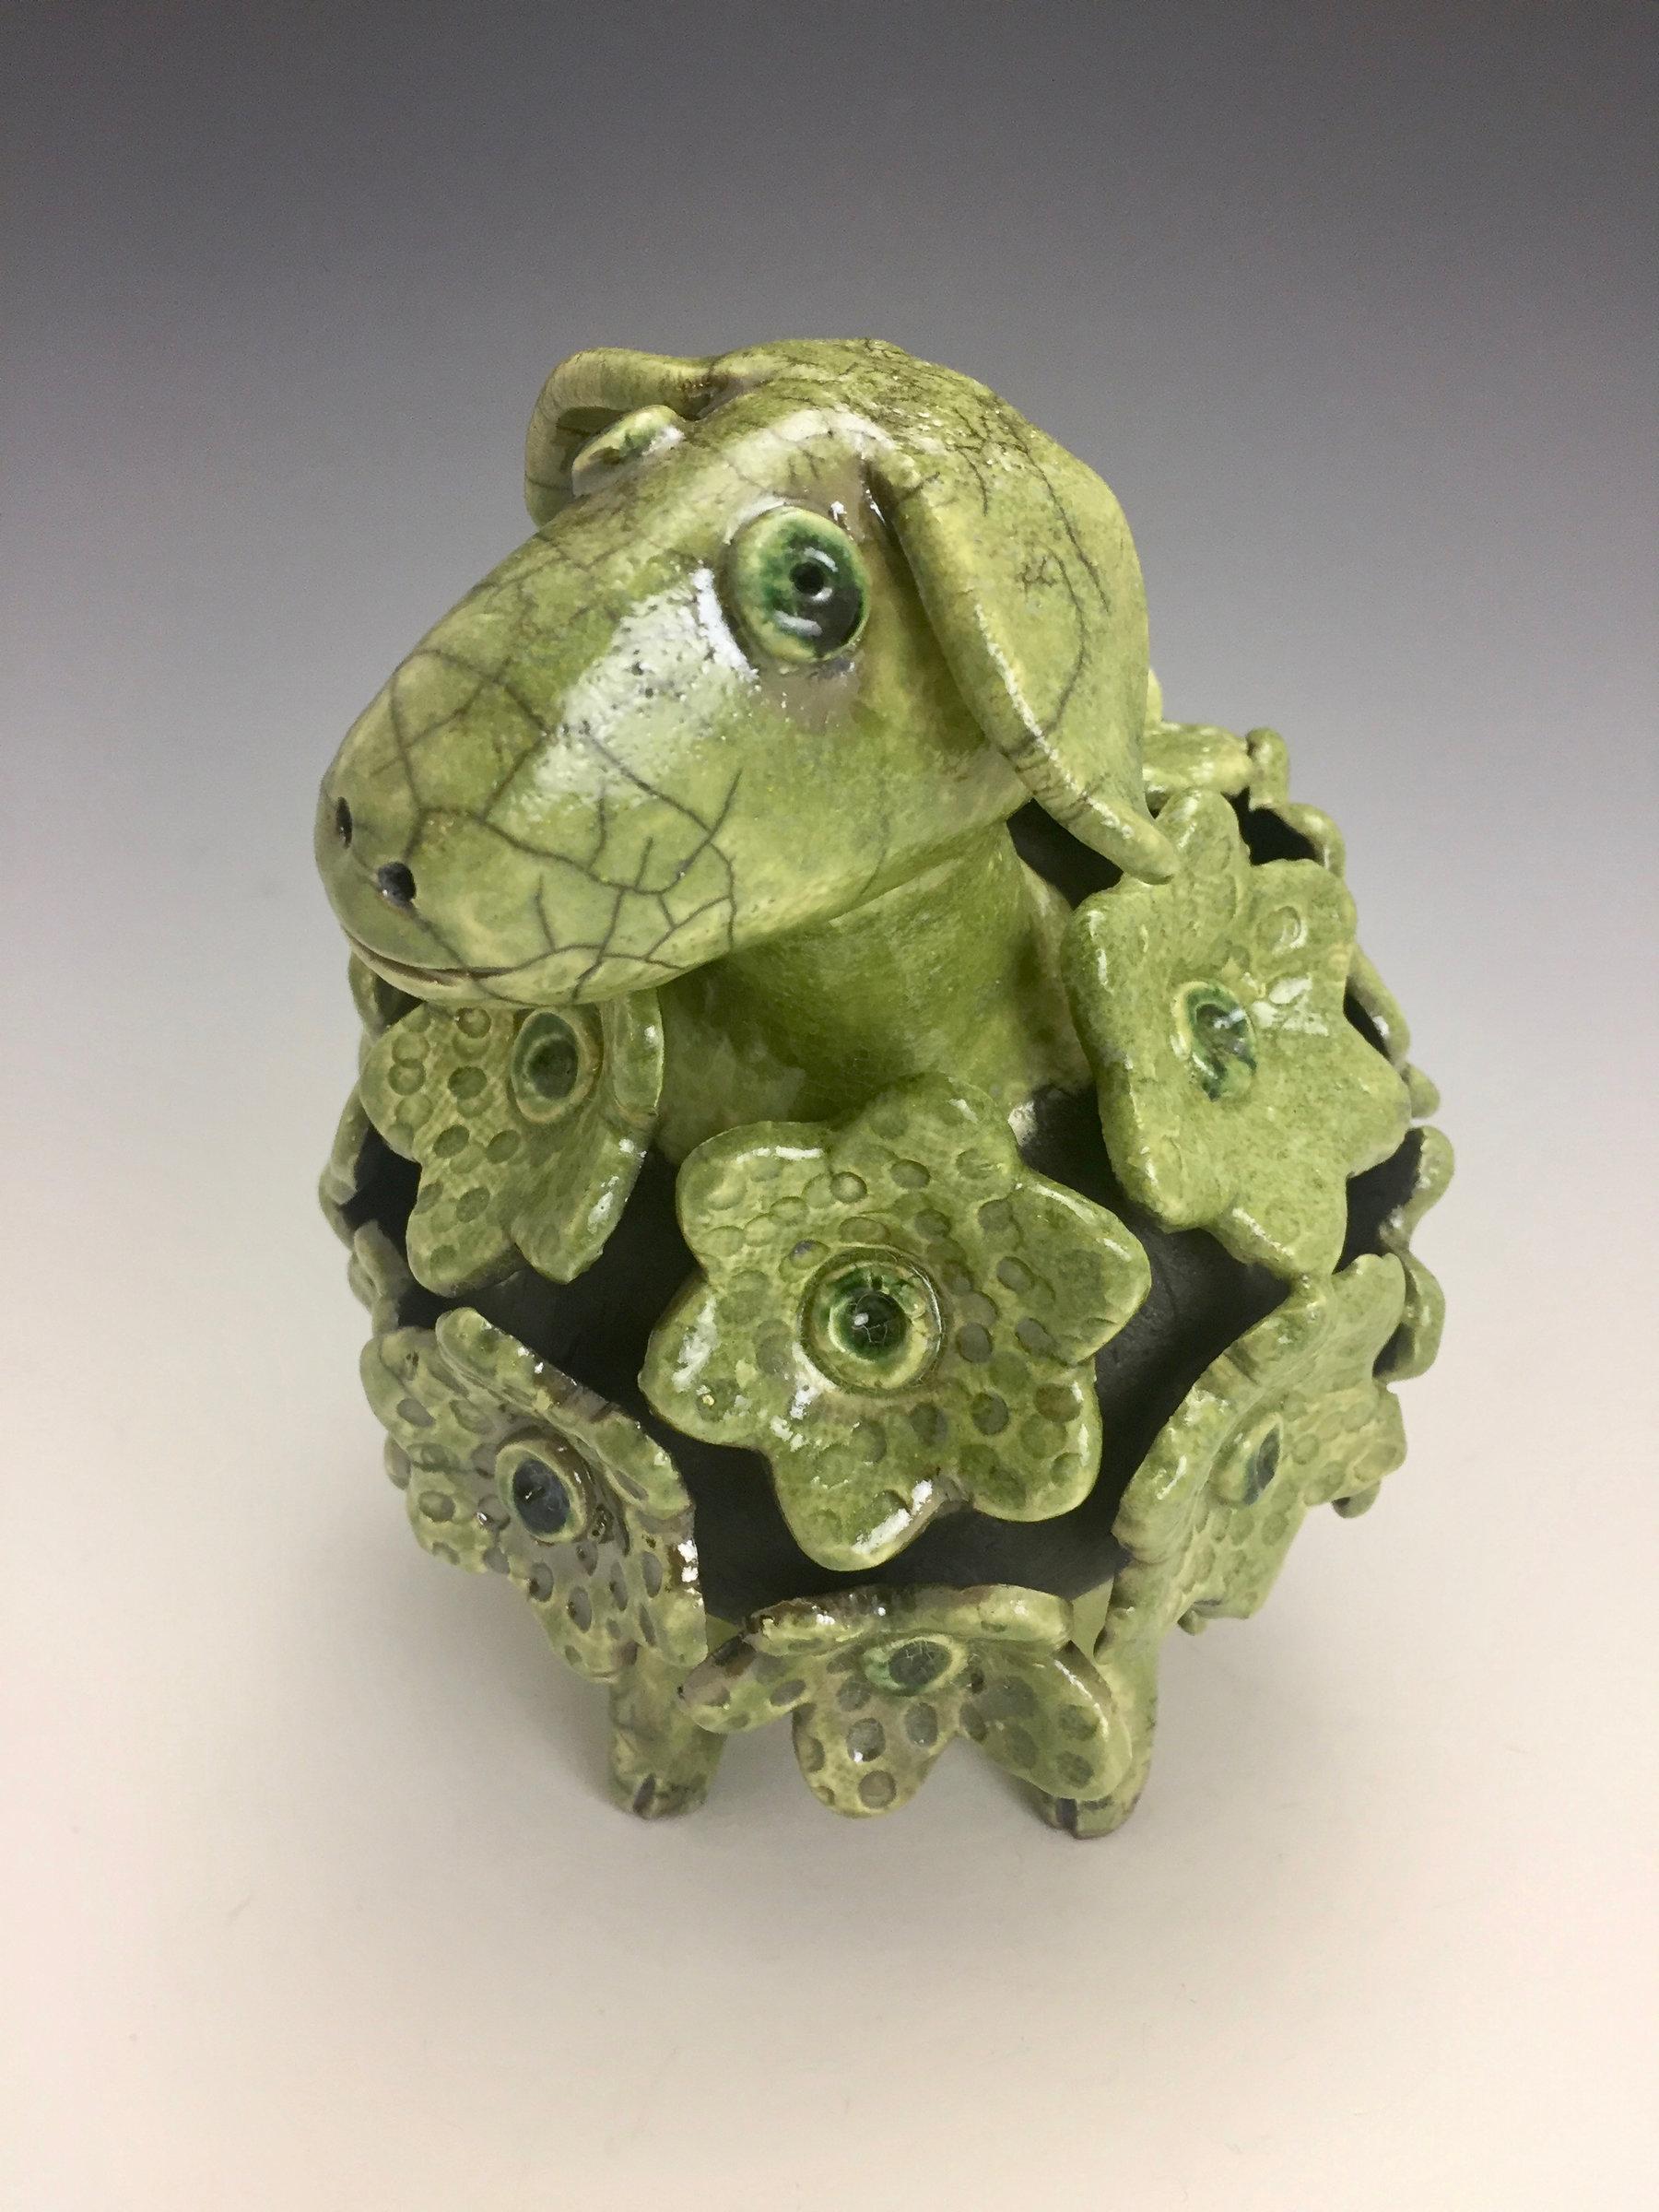 Balthazar Green Sheep Raku Sculpture By Lilia Venier